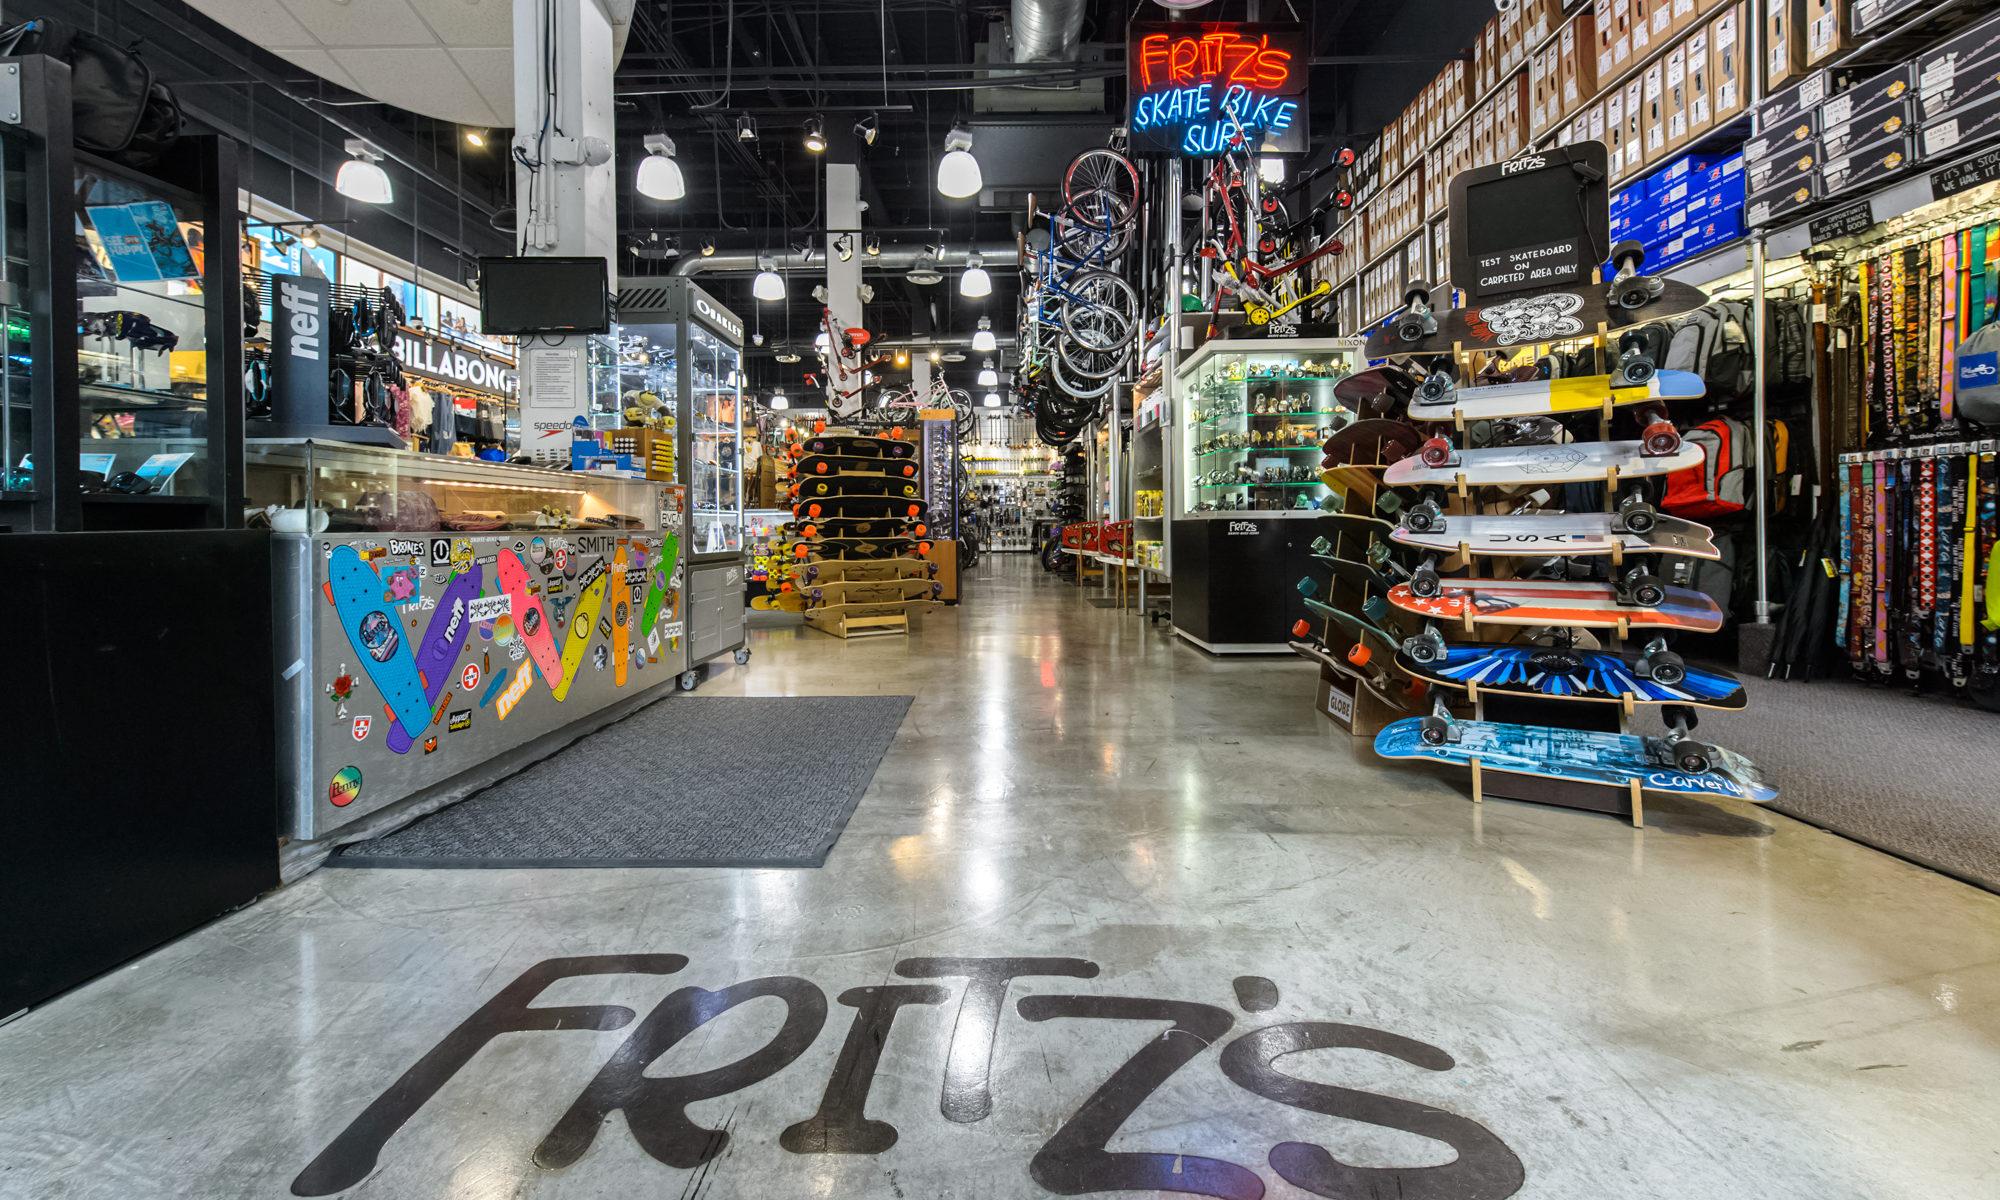 Fritz Skate Bike Surf Promo store front